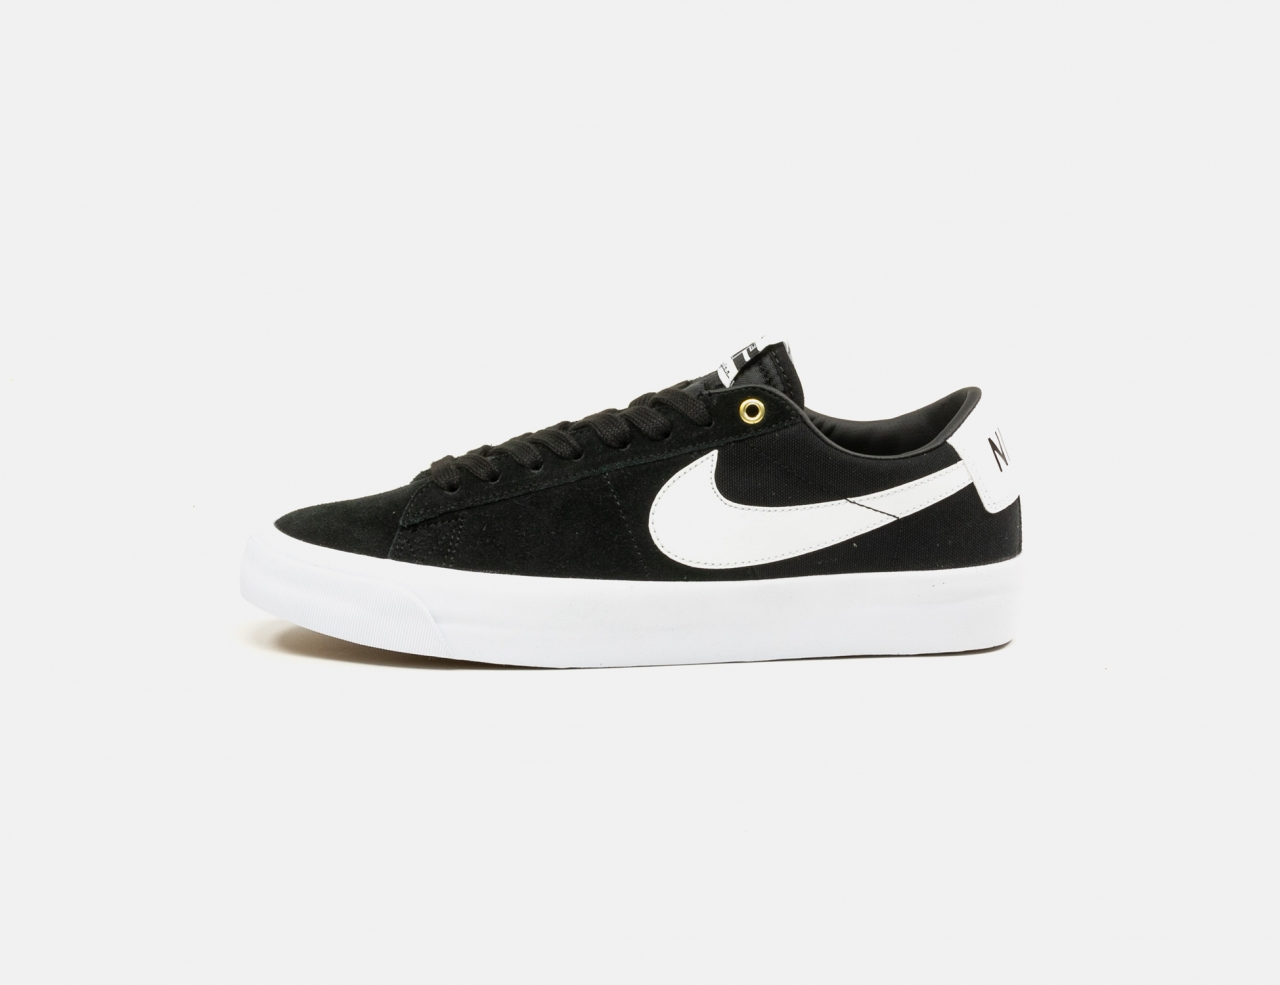 Nike SB Zoom Blazer Low Pro GT Sneaker - Black / White